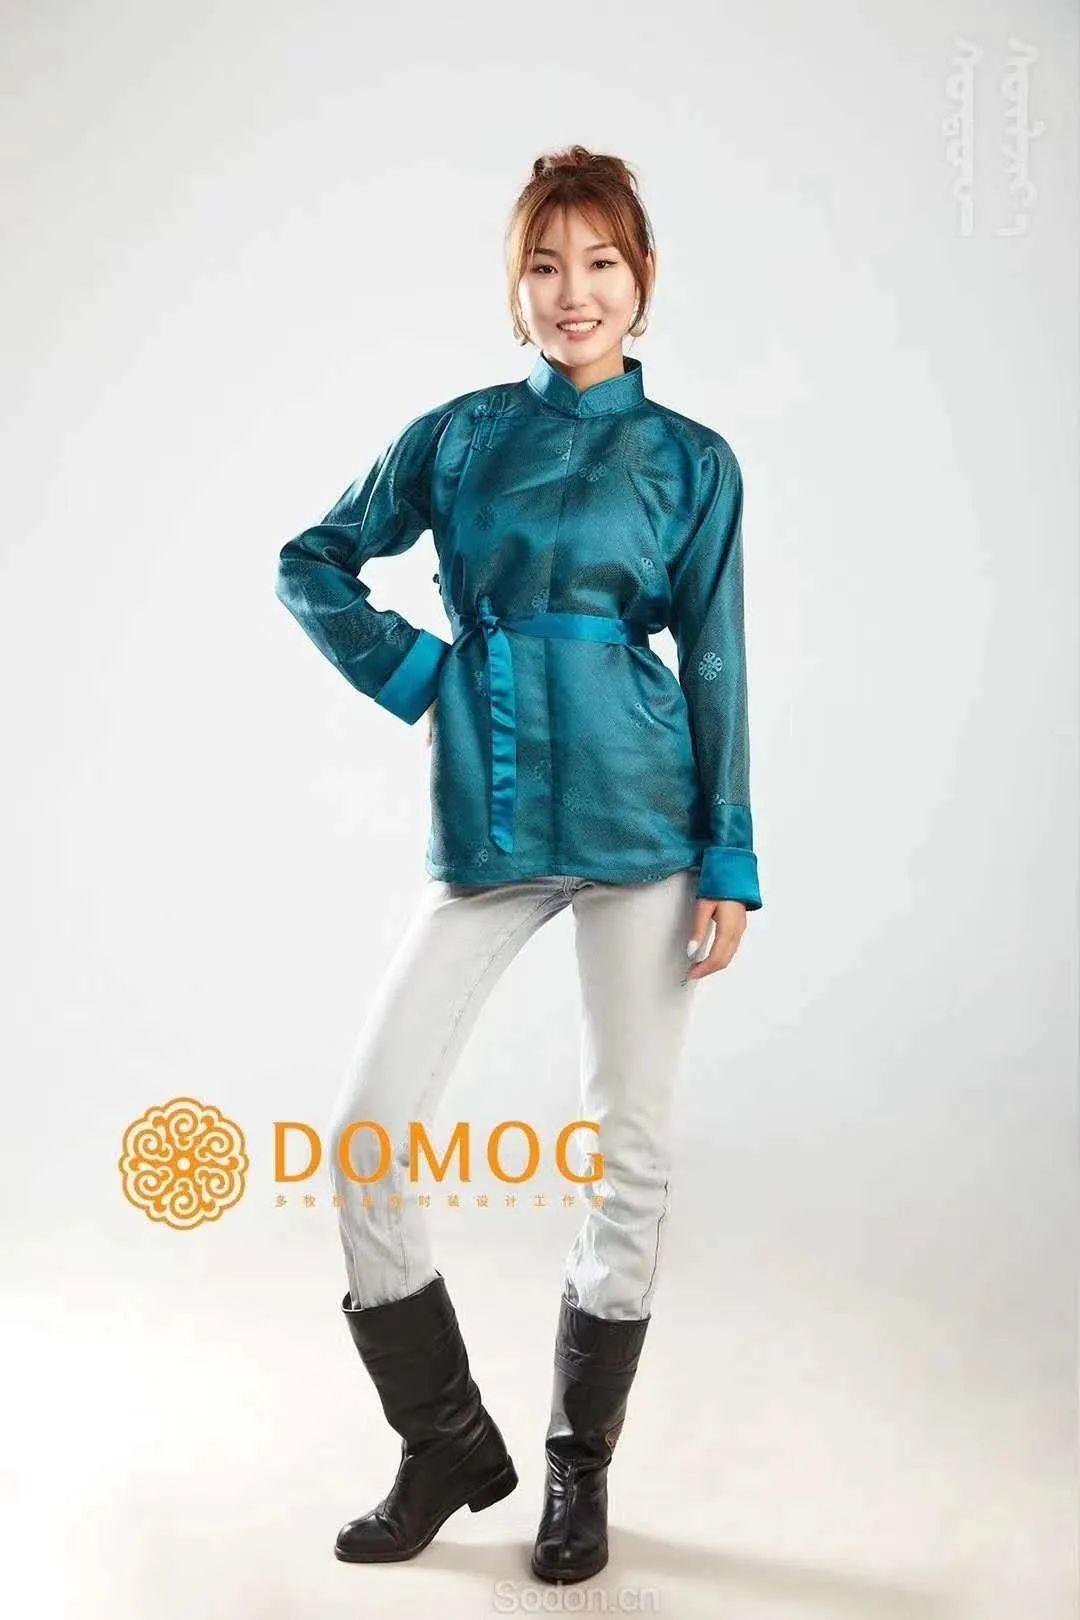 DOMOG 蒙古时装2020新款,民族与时尚的融合 第41张 DOMOG 蒙古时装2020新款,民族与时尚的融合 蒙古服饰